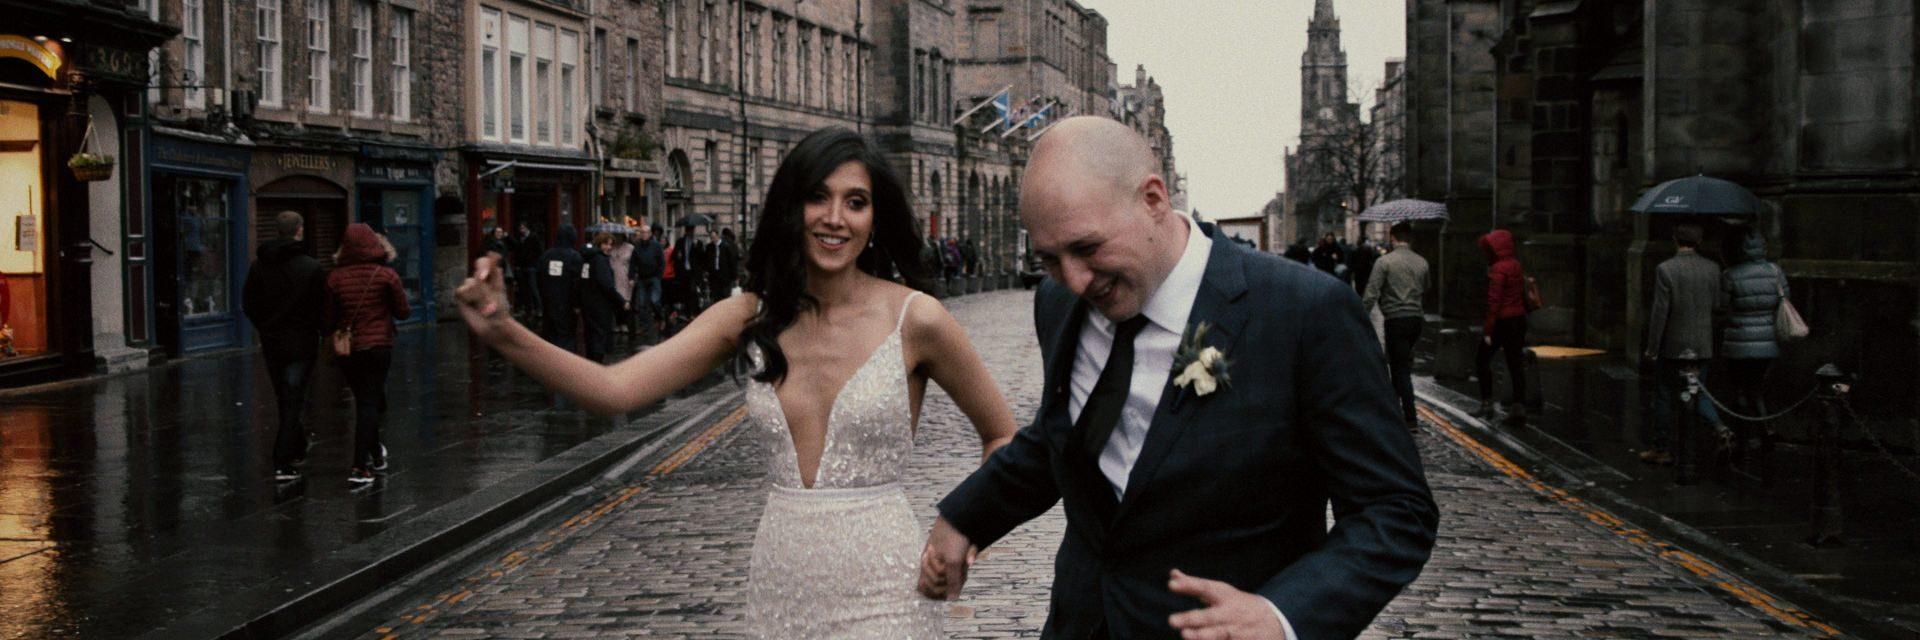 Lindos-wedding-videographer-cinemate-films-04